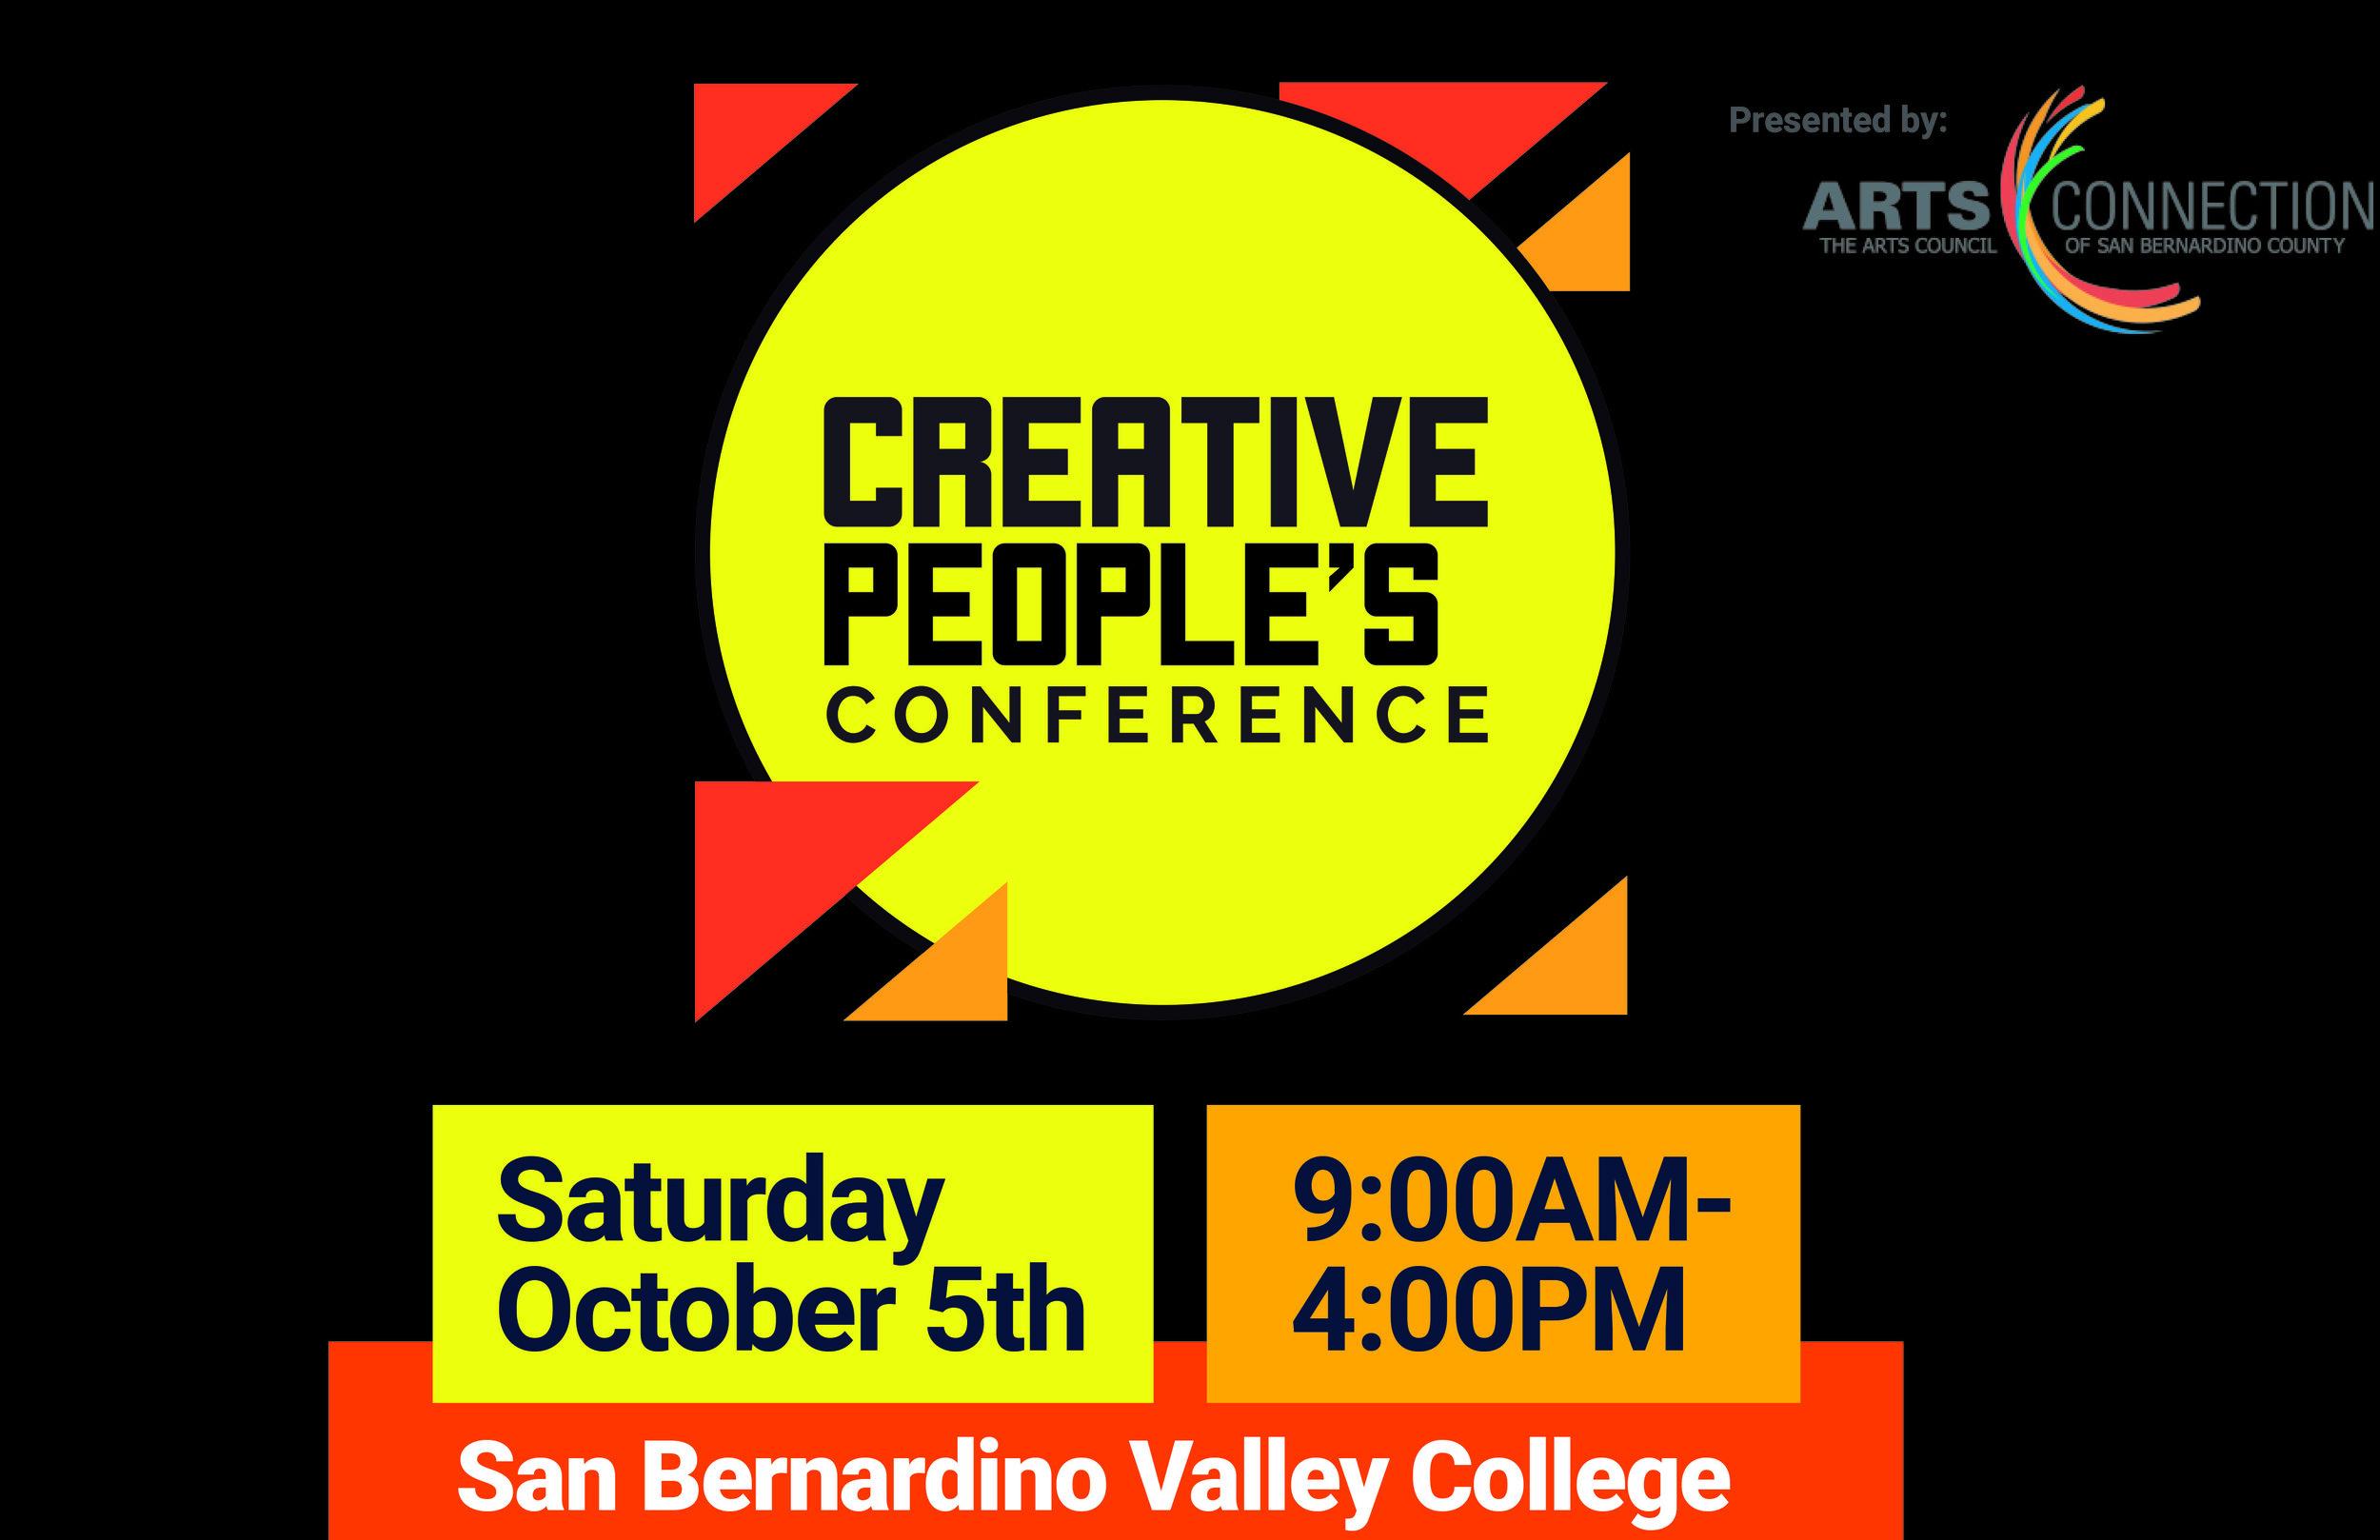 Creative People's Conference - October 5, 2019   9AM - 4PMSan Bernardino Valley College701 S. Mt. Vernon Ave., San Bernardino, CA 92410